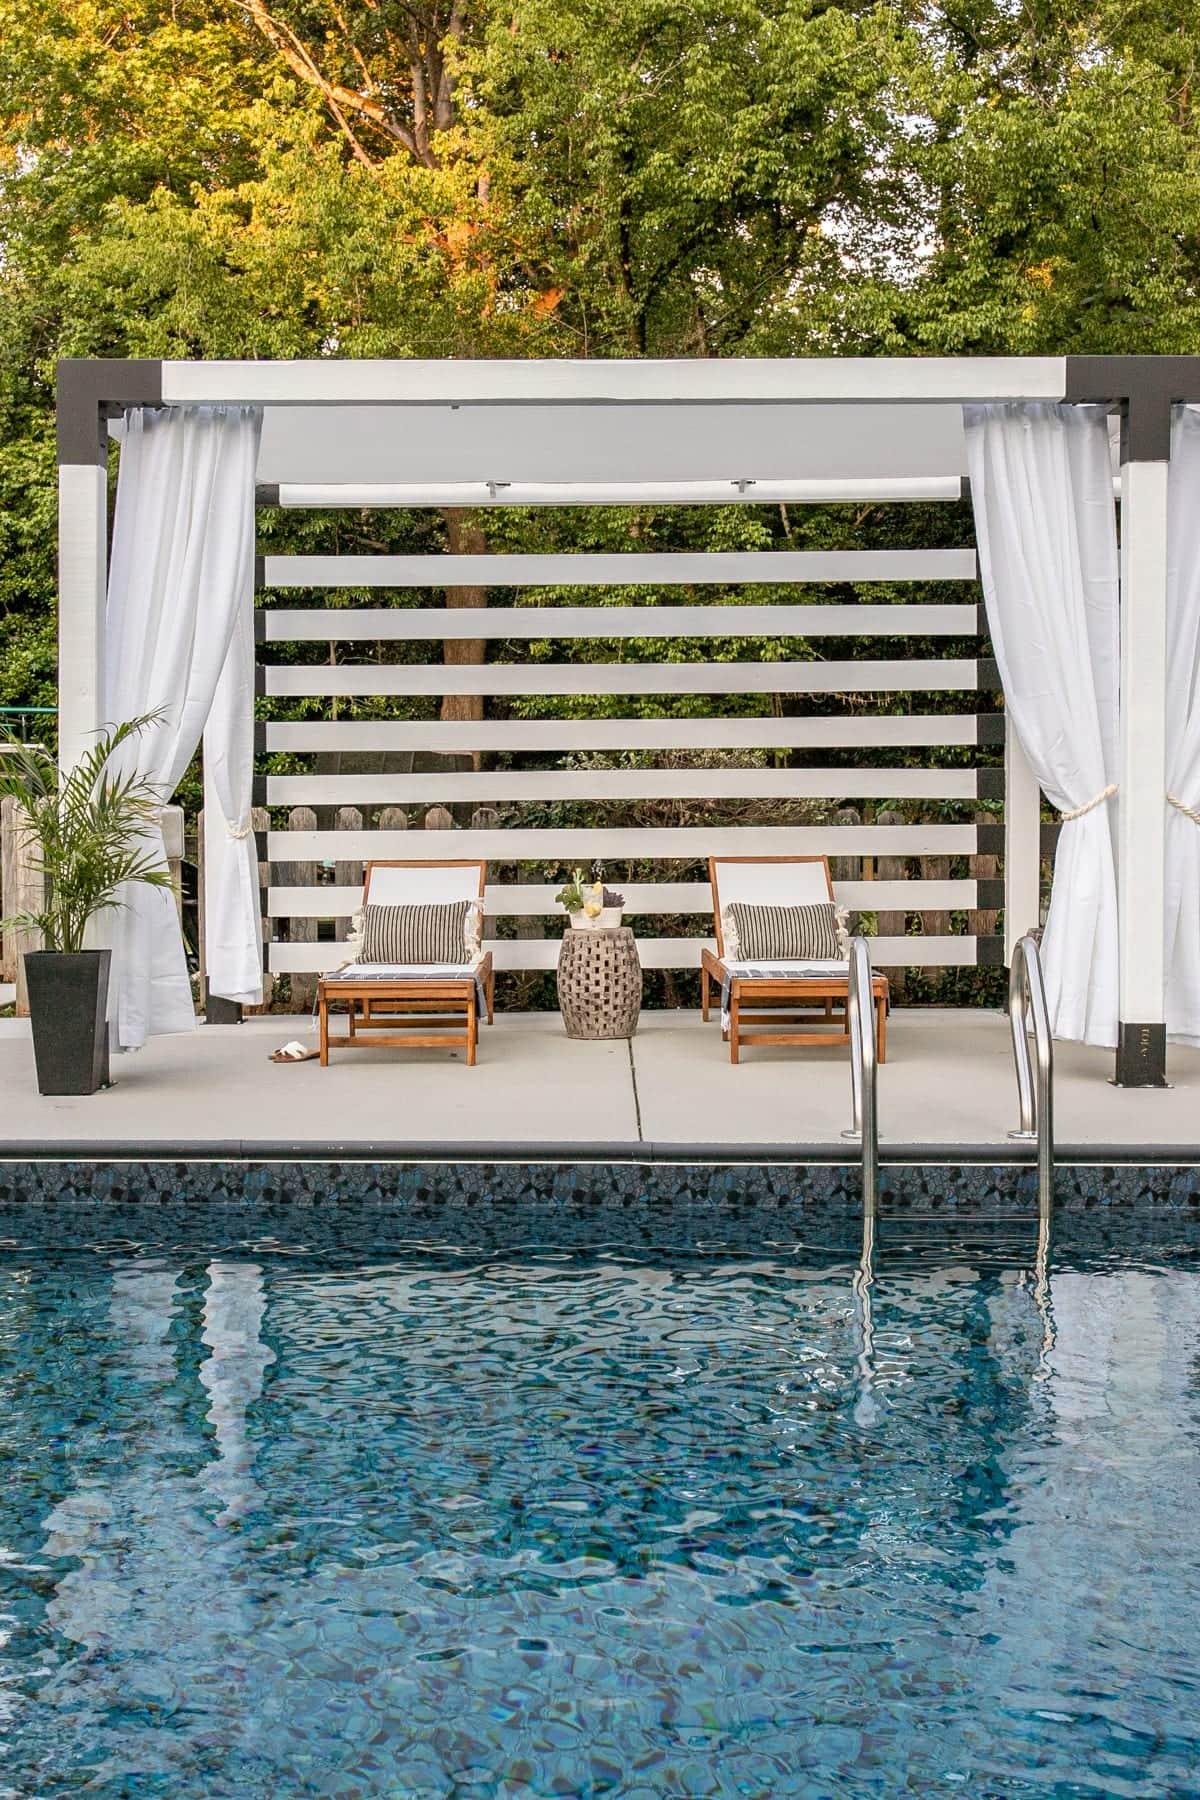 backyard pergola poolside cabana with white outdoor curtains